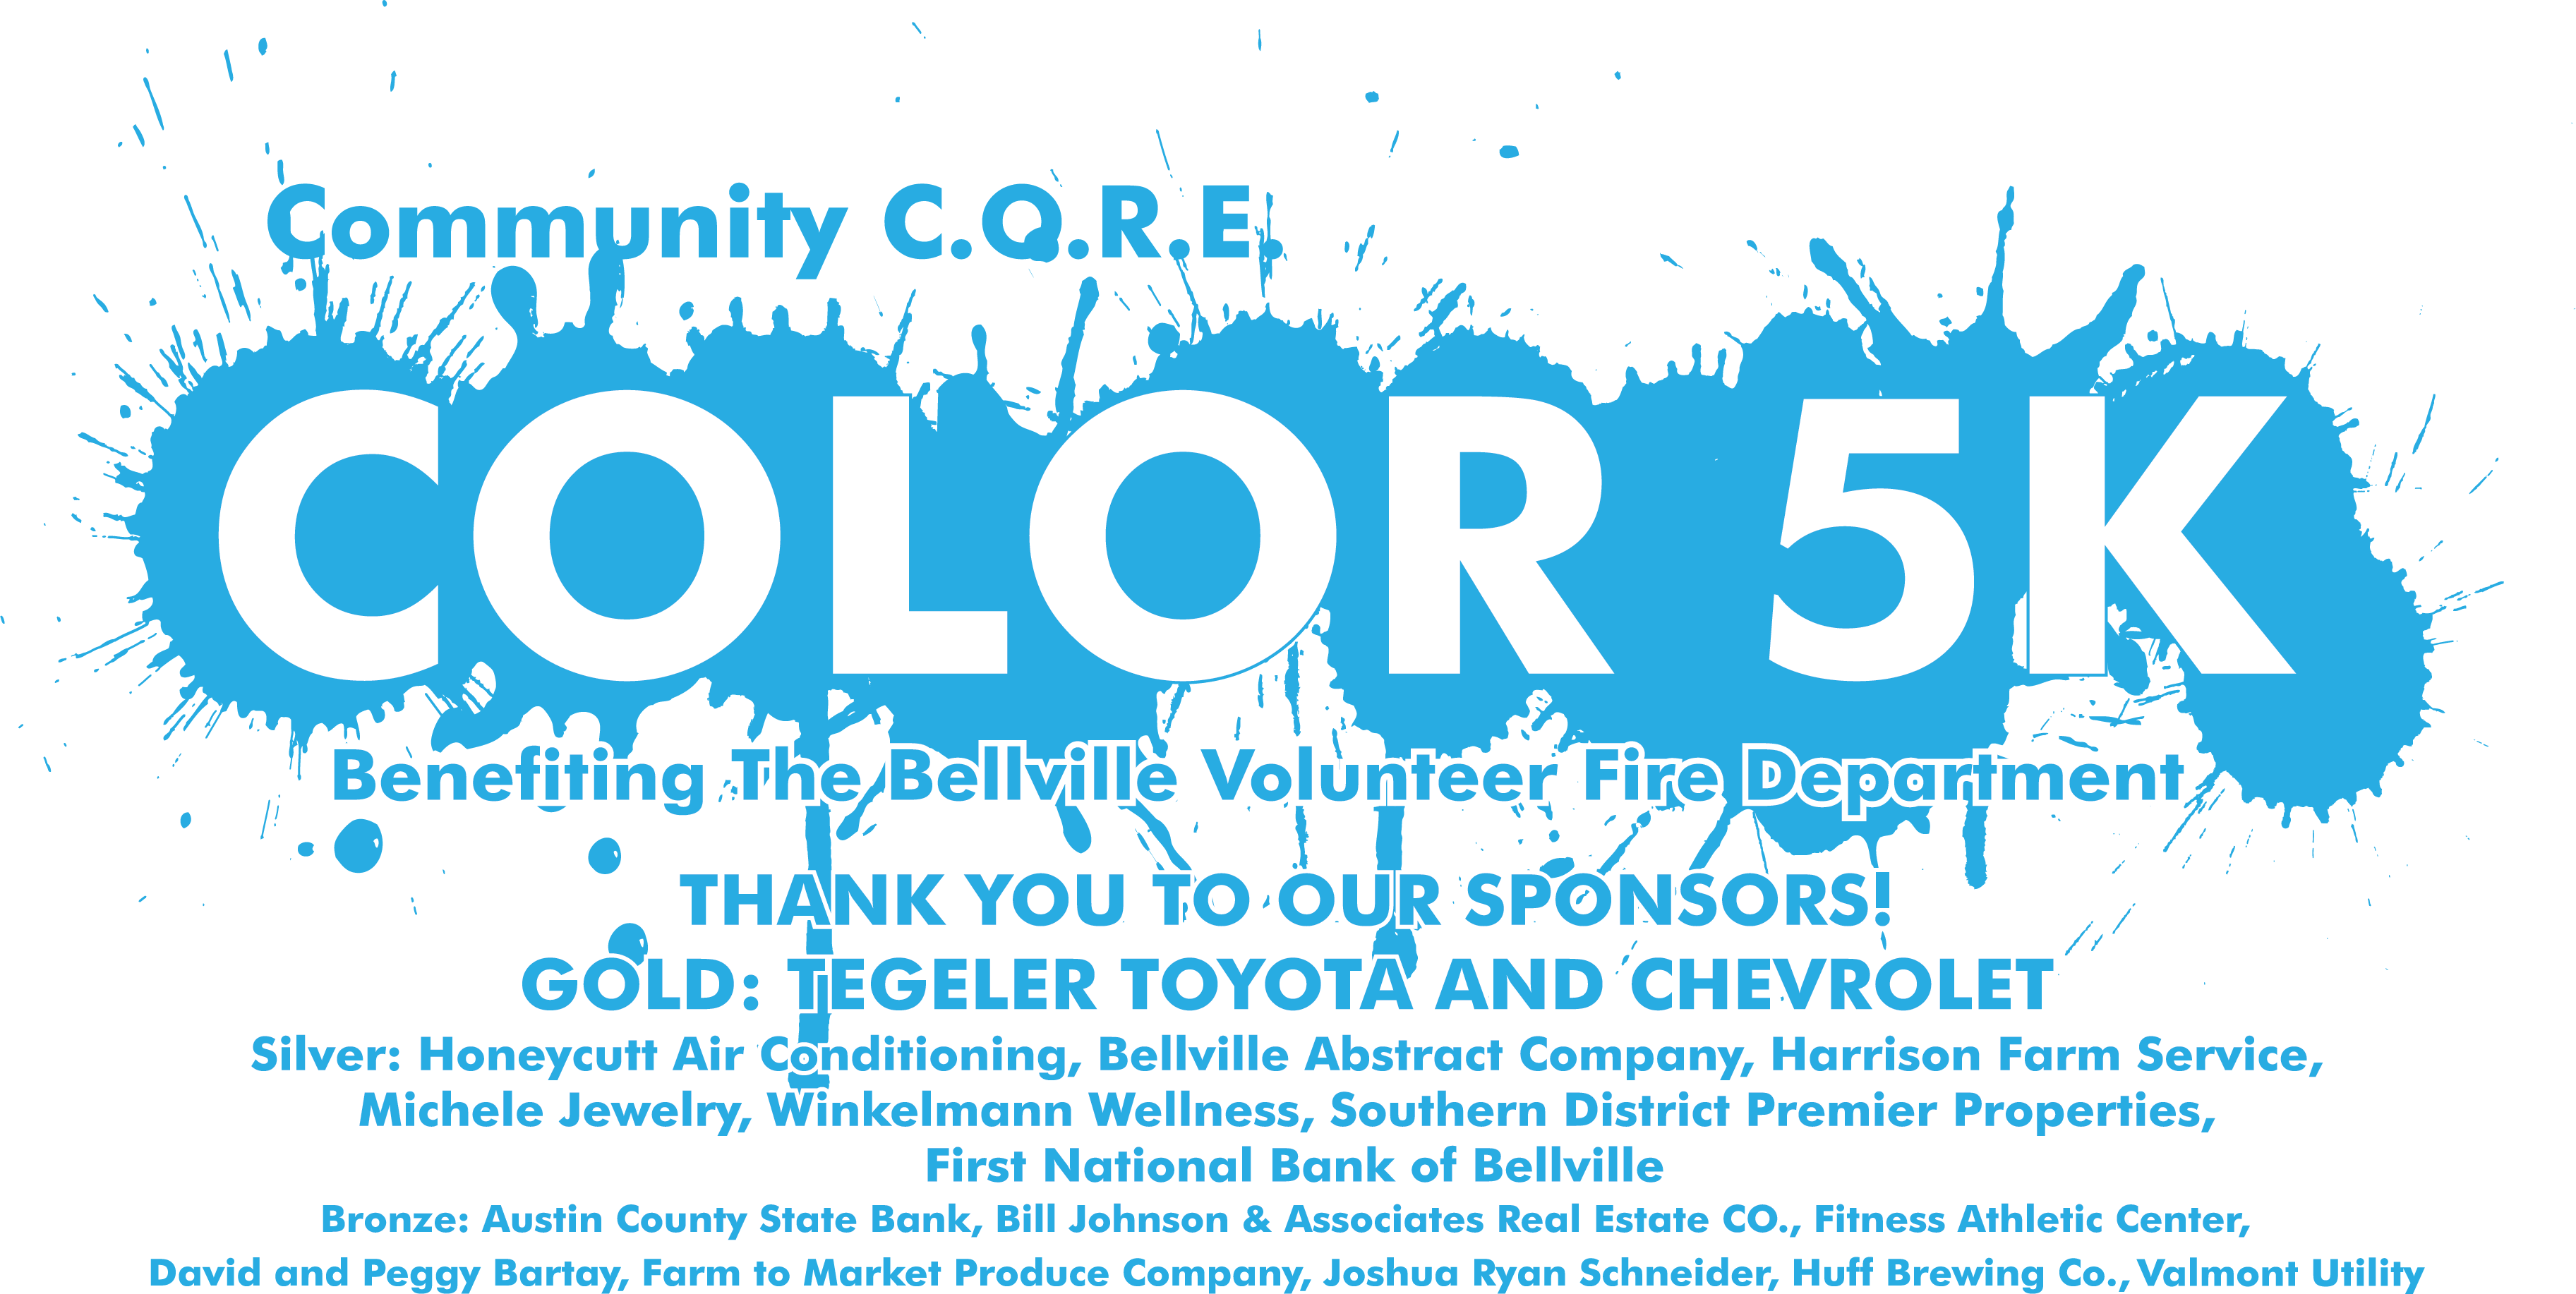 community core 5k 2017